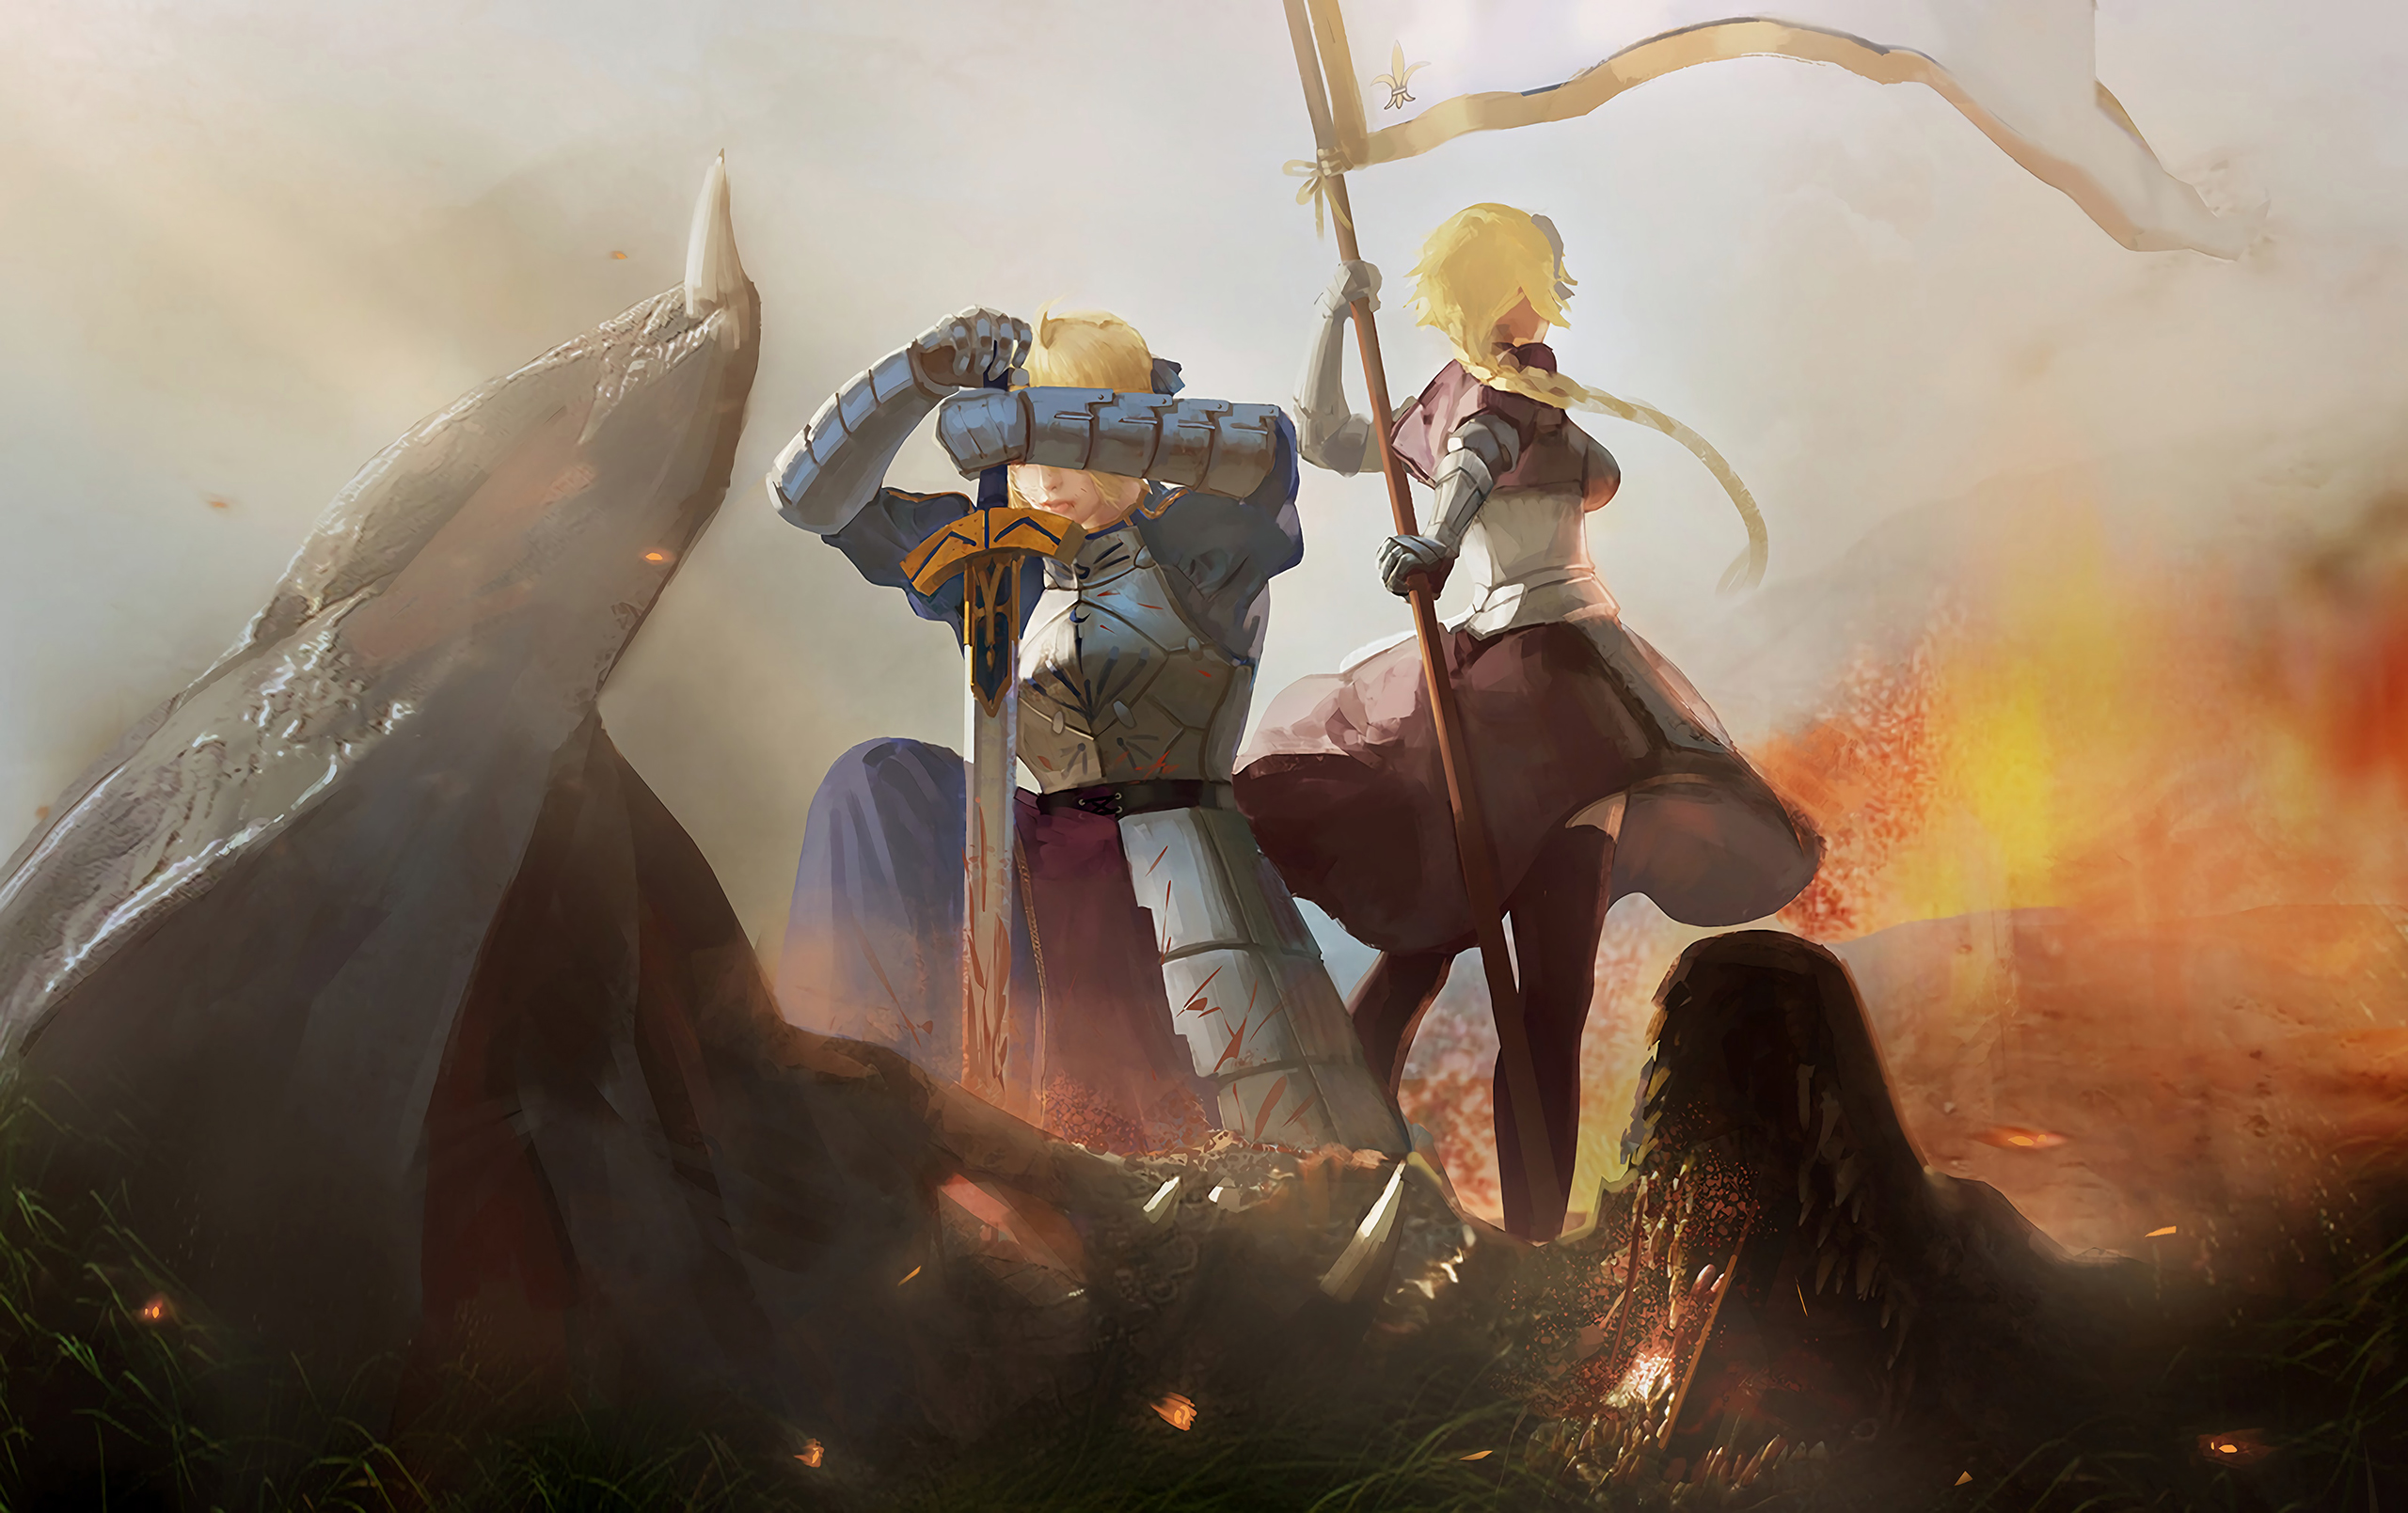 Fondos de pantalla Anime Personajes de Fate Grand order